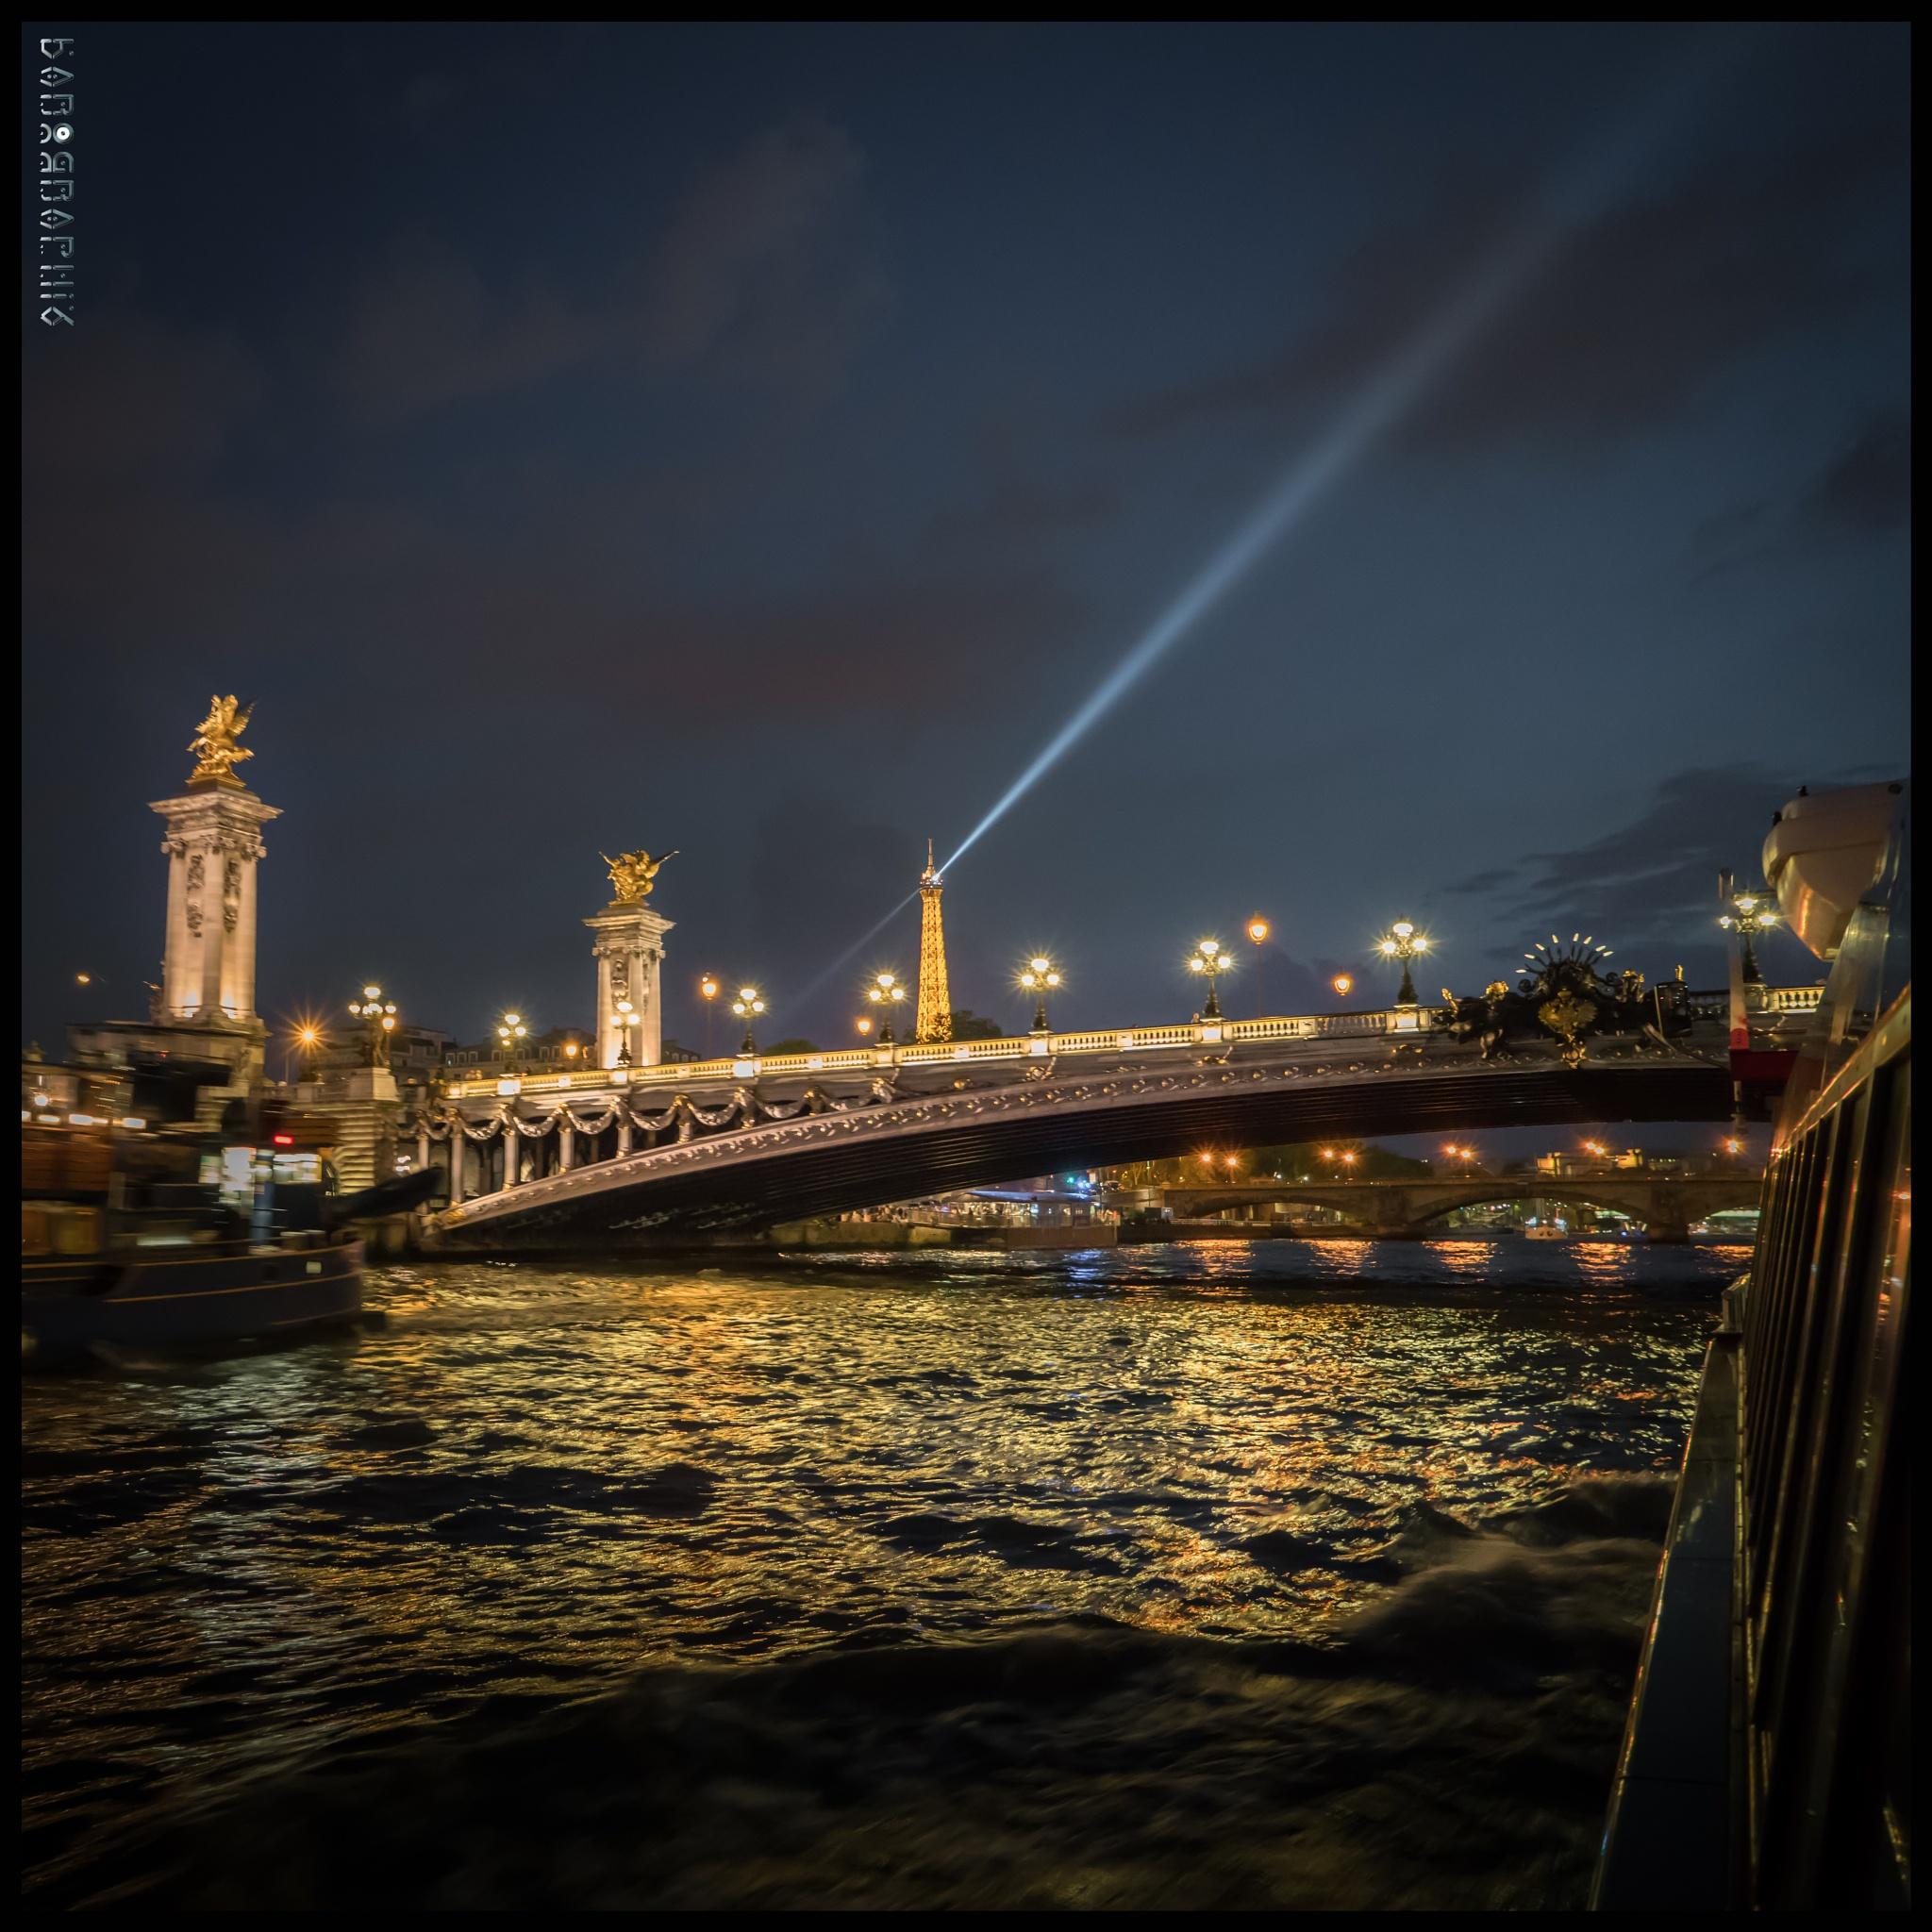 On the river Seine by Karographix